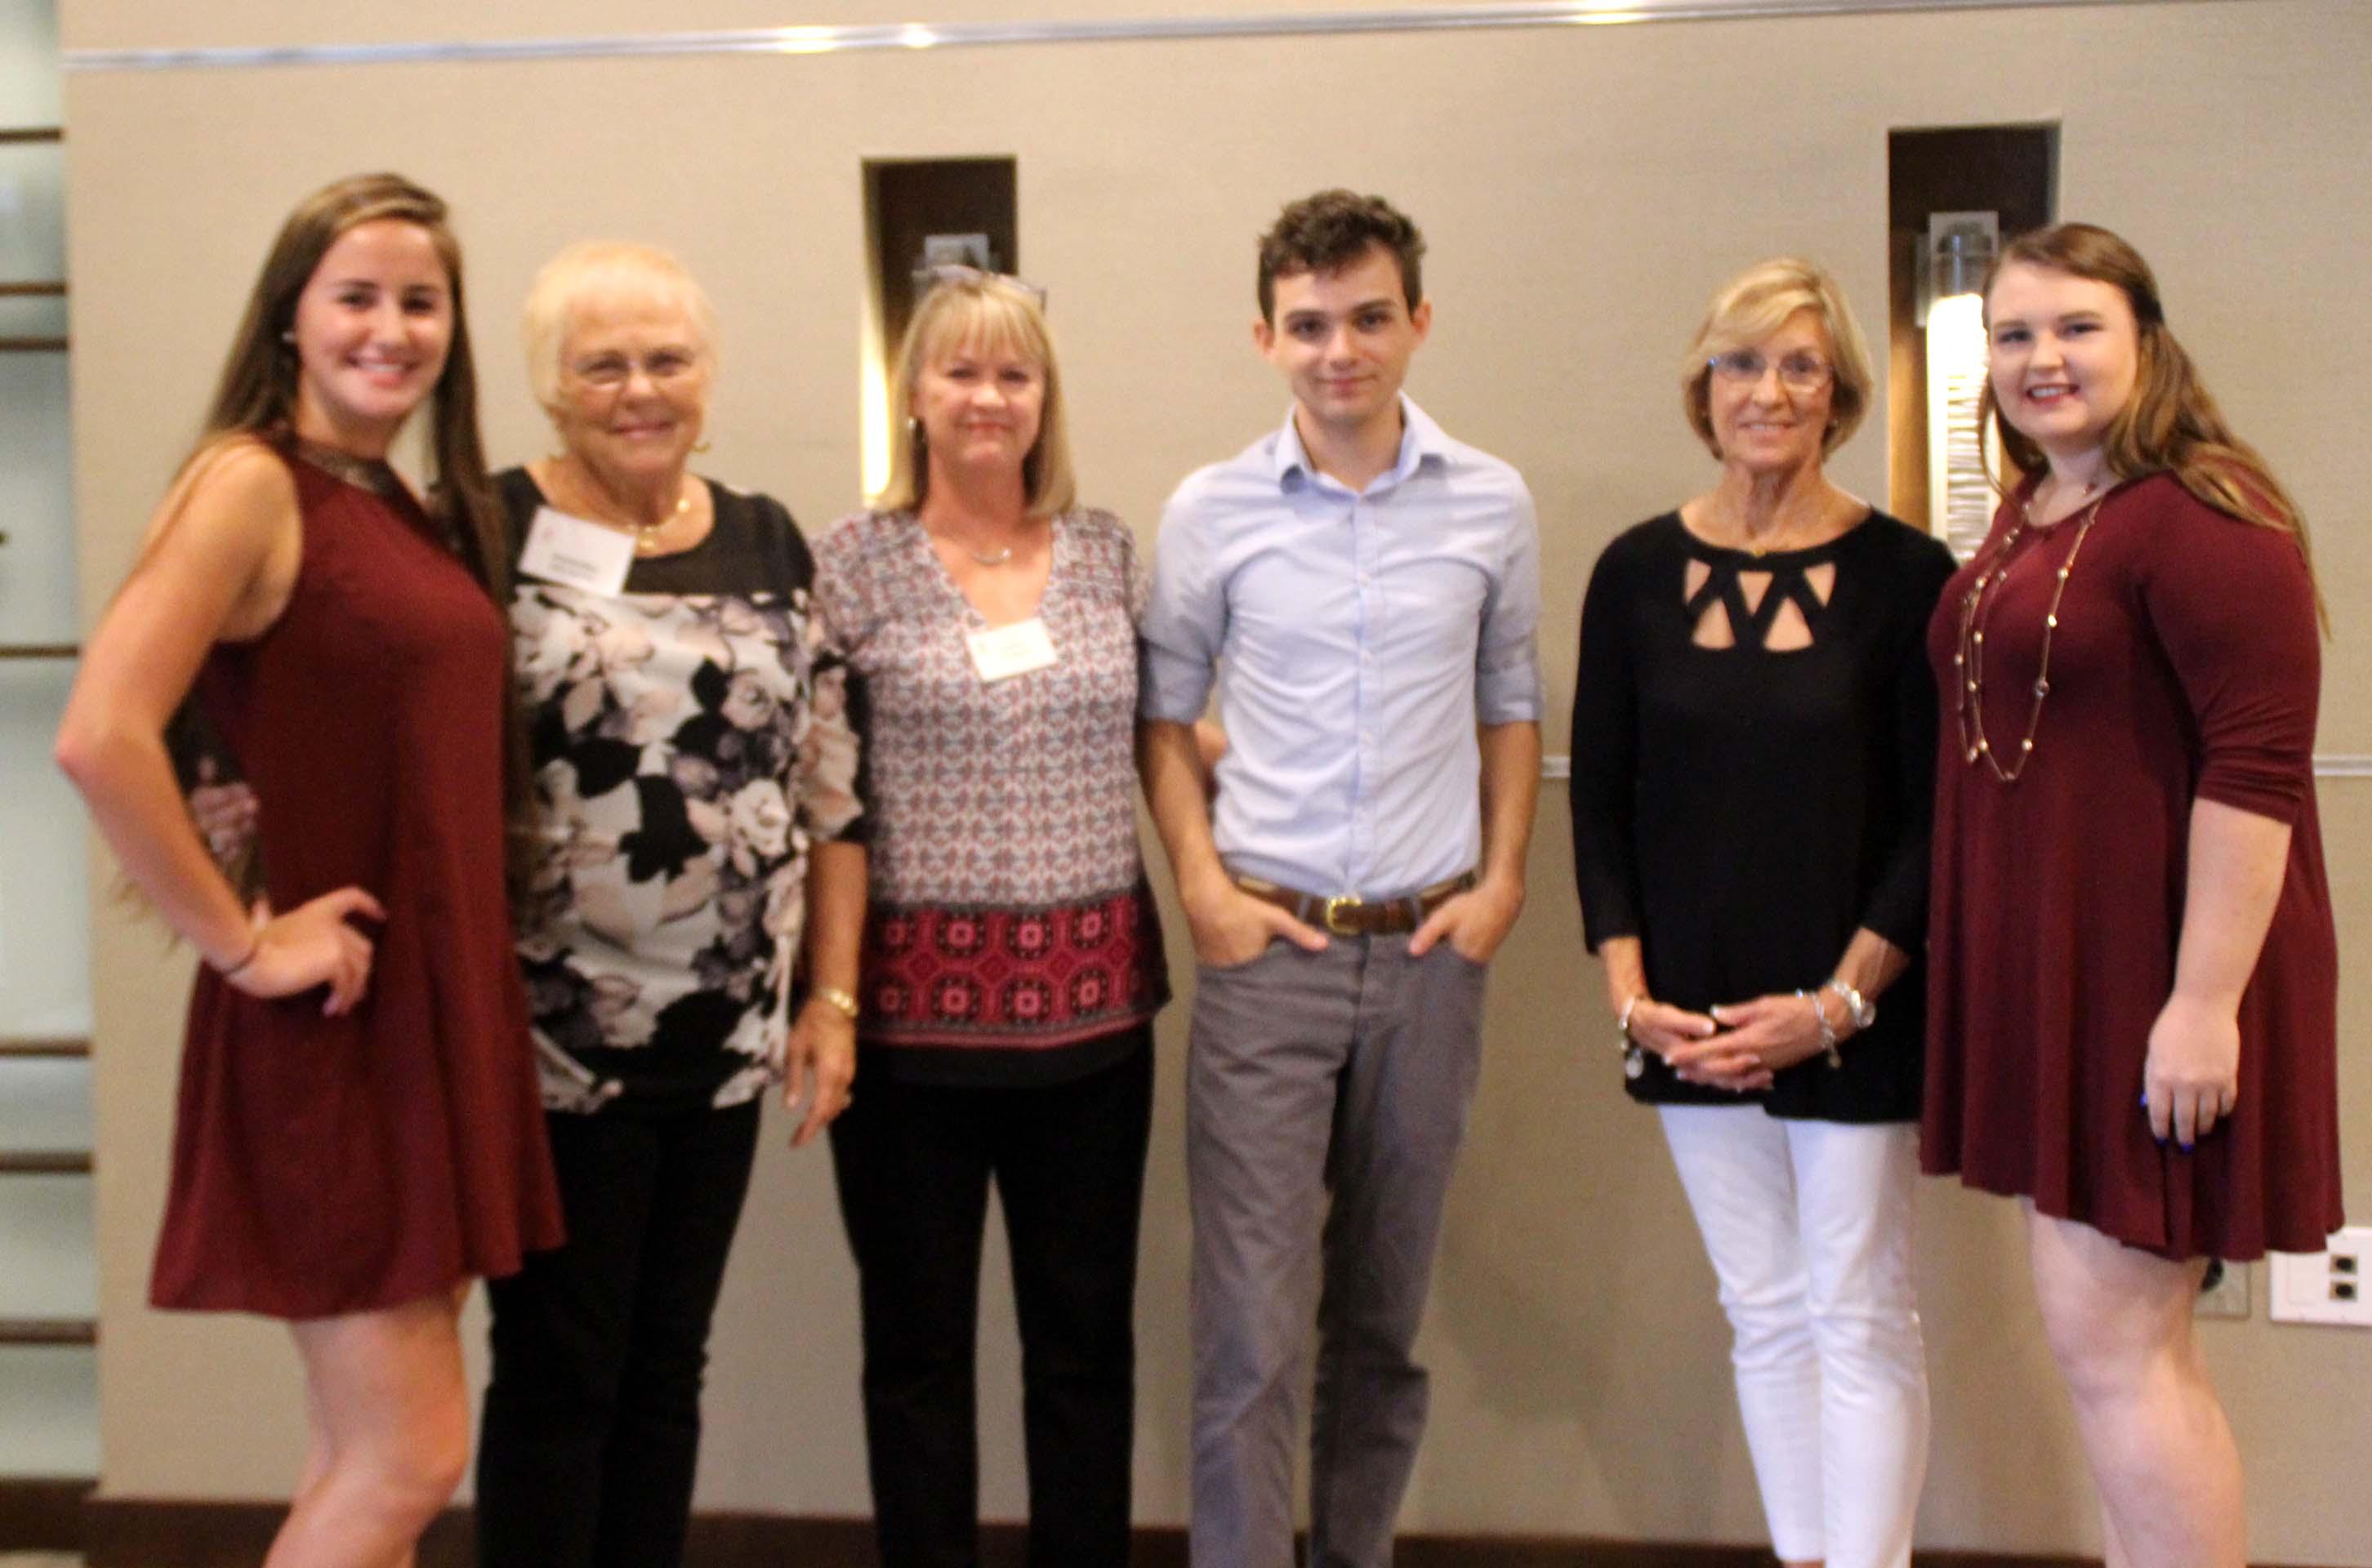 The Monroe Kokin Memorial Sarasota Orchid Society Scholarship